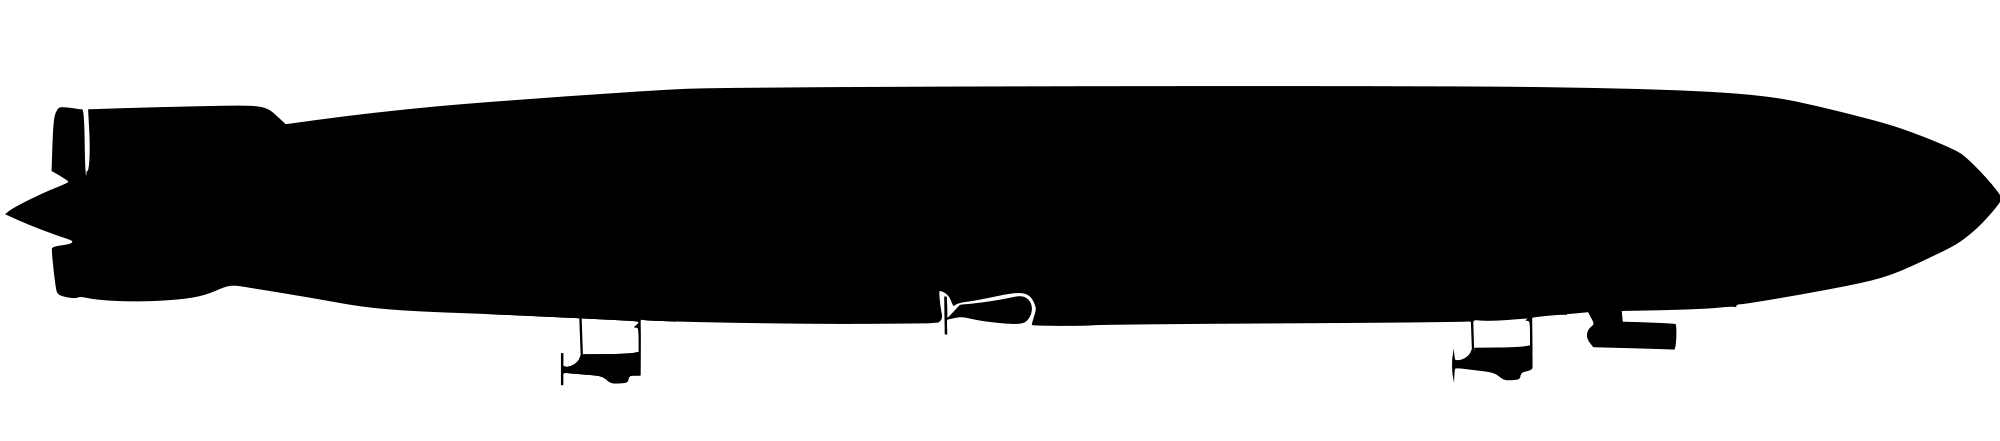 2000x441 Lanz 1916.svg